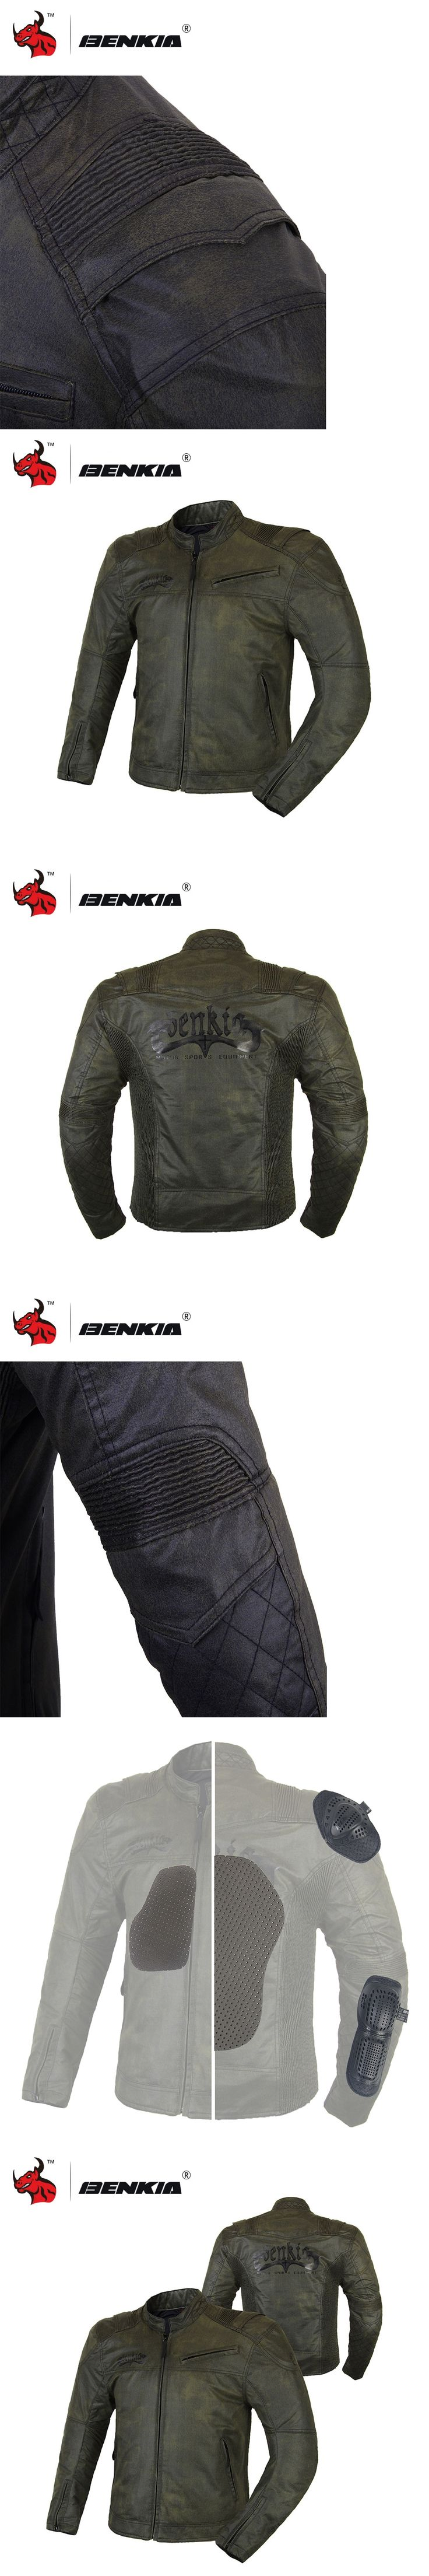 BENKIA Motorcycle Jackets Motocross Off-Road Racing Jacket Medieval Retro Style Moto Jacket Blouson Moto Summer Jacket Men